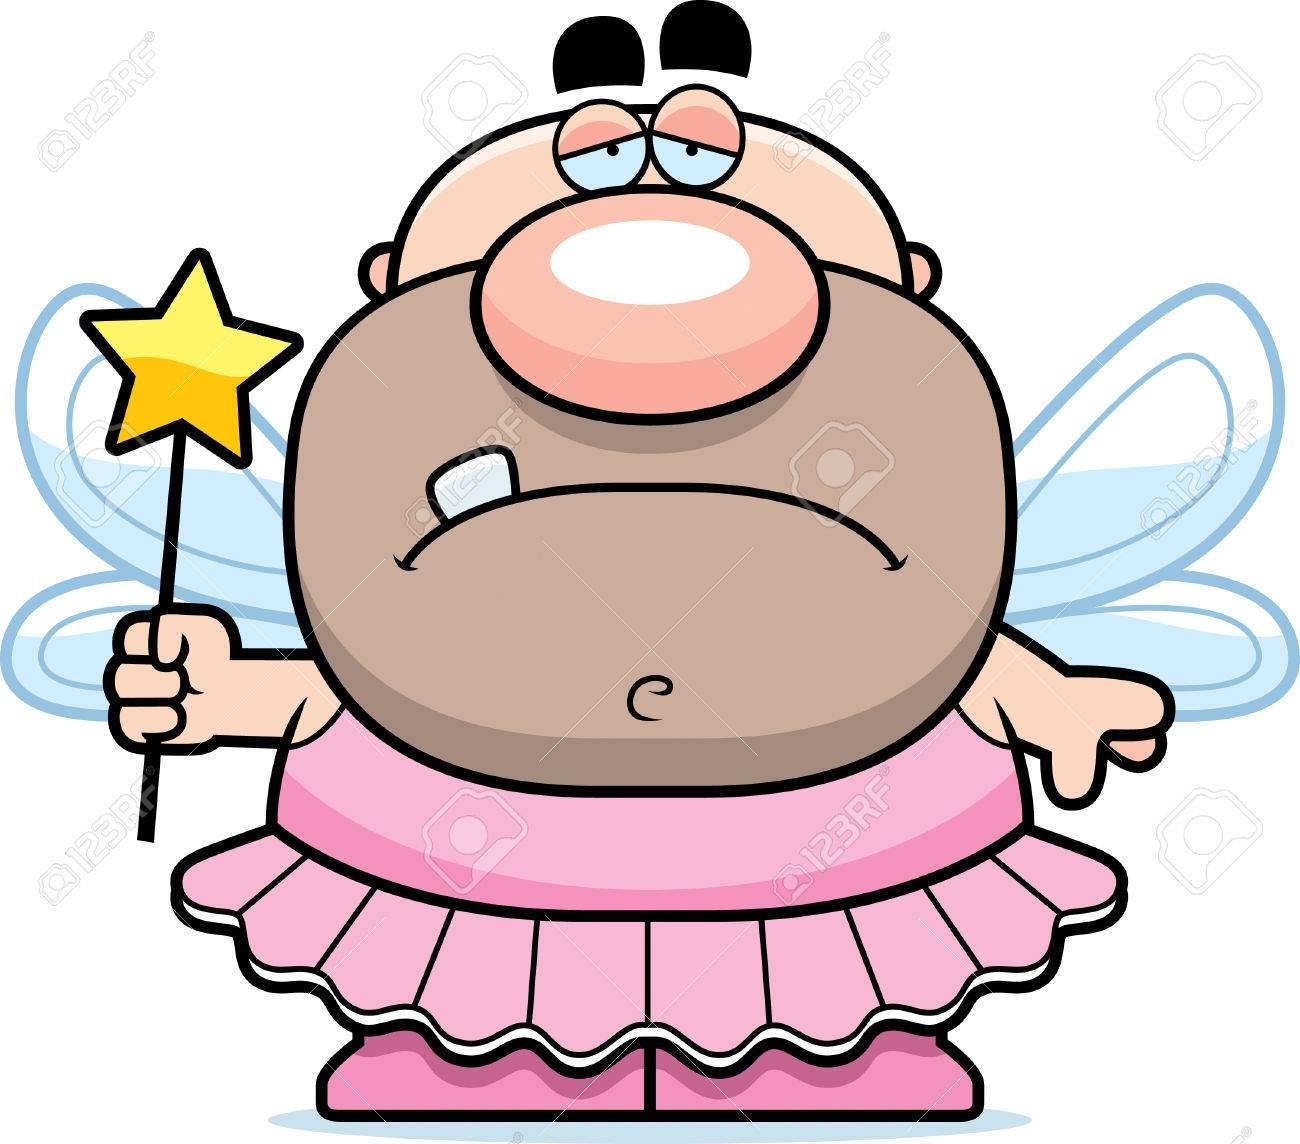 a cartoon illustration of a tooth fairy looking sad royalty free rh 123rf com tooth fairy clip art free tooth fairy clipart free printable